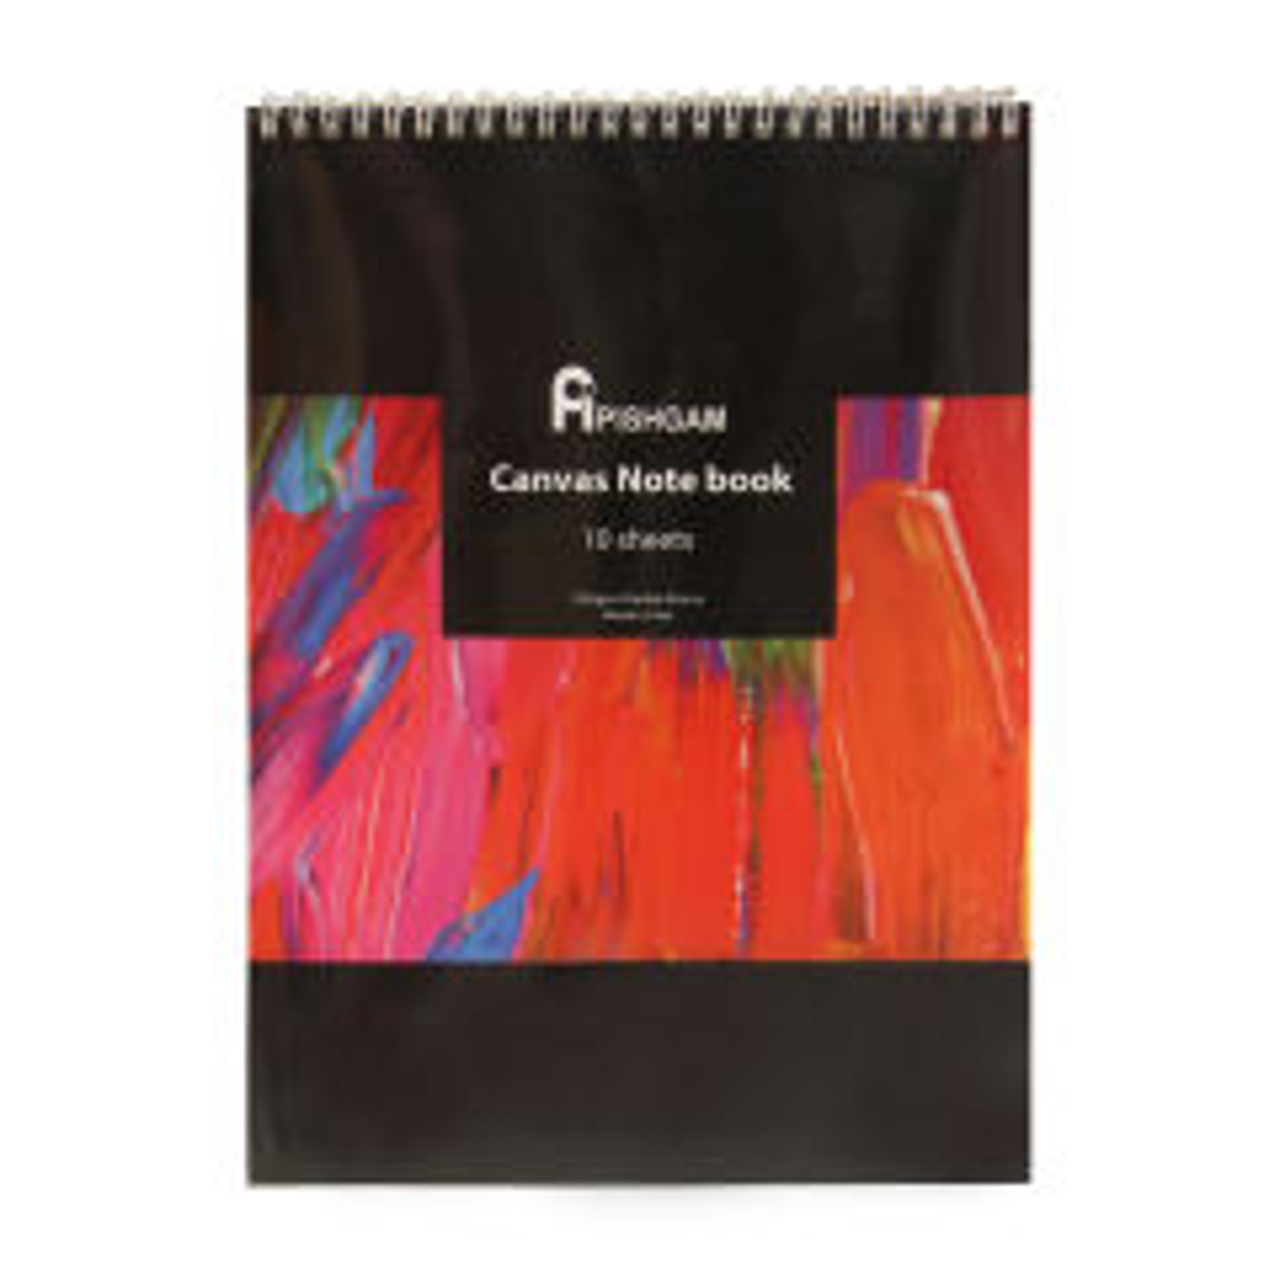 بوم دفترچه ای پیشگام مدل Canvas Notebook Wired سایز 20x30 سانتی متر